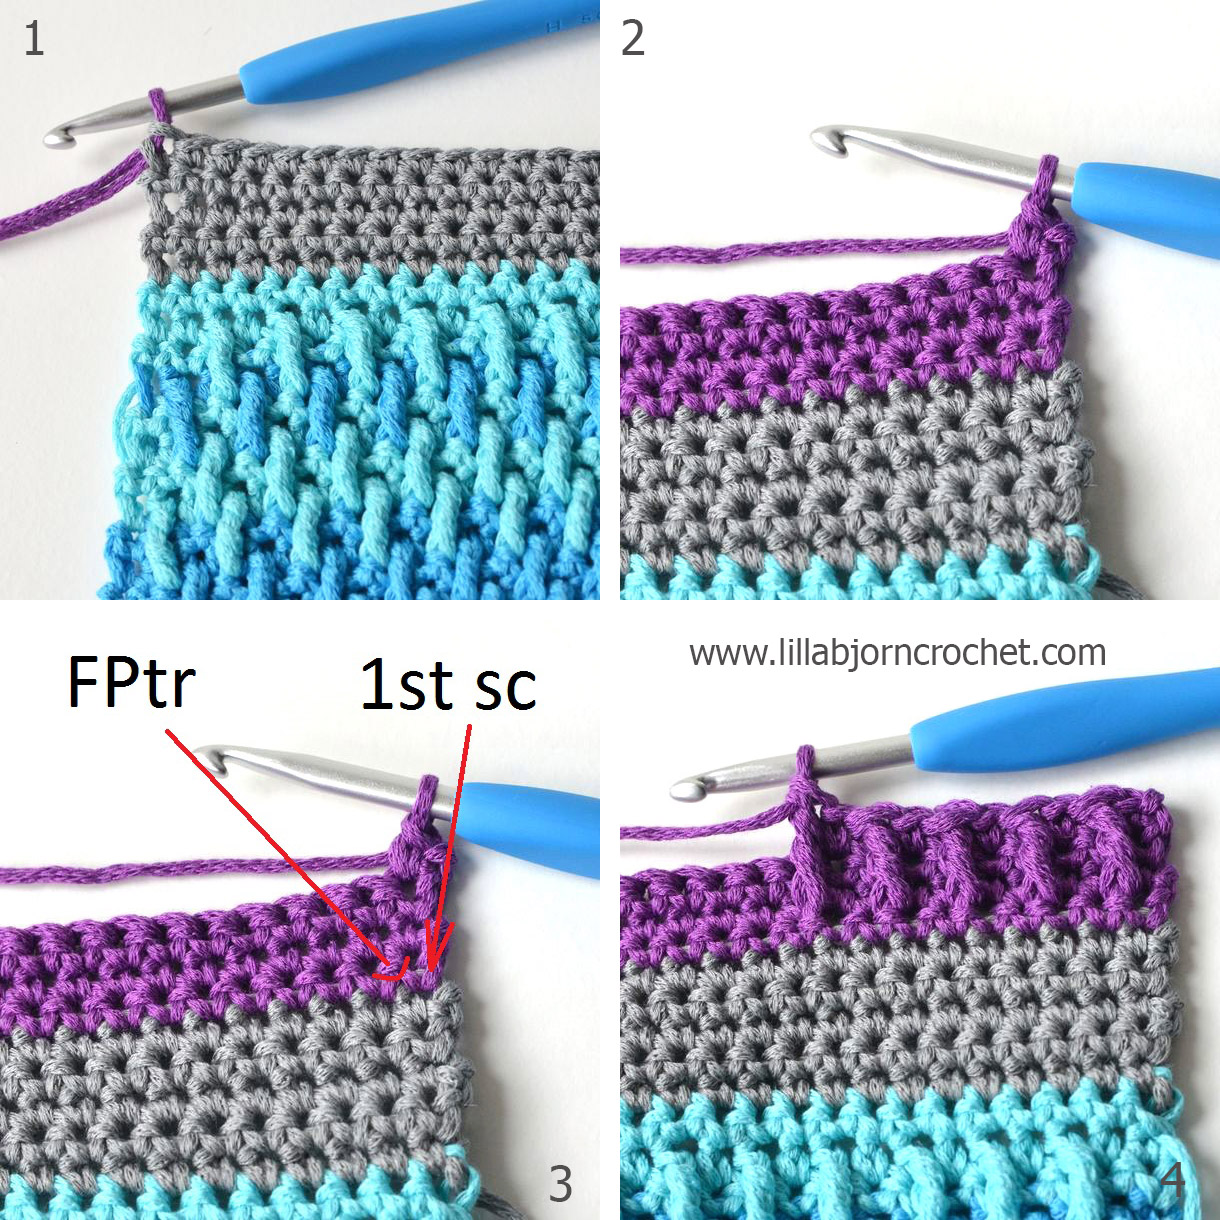 Öresund Sky Bathmat - Free crochet pattern by Lilla Bjorn Crochet